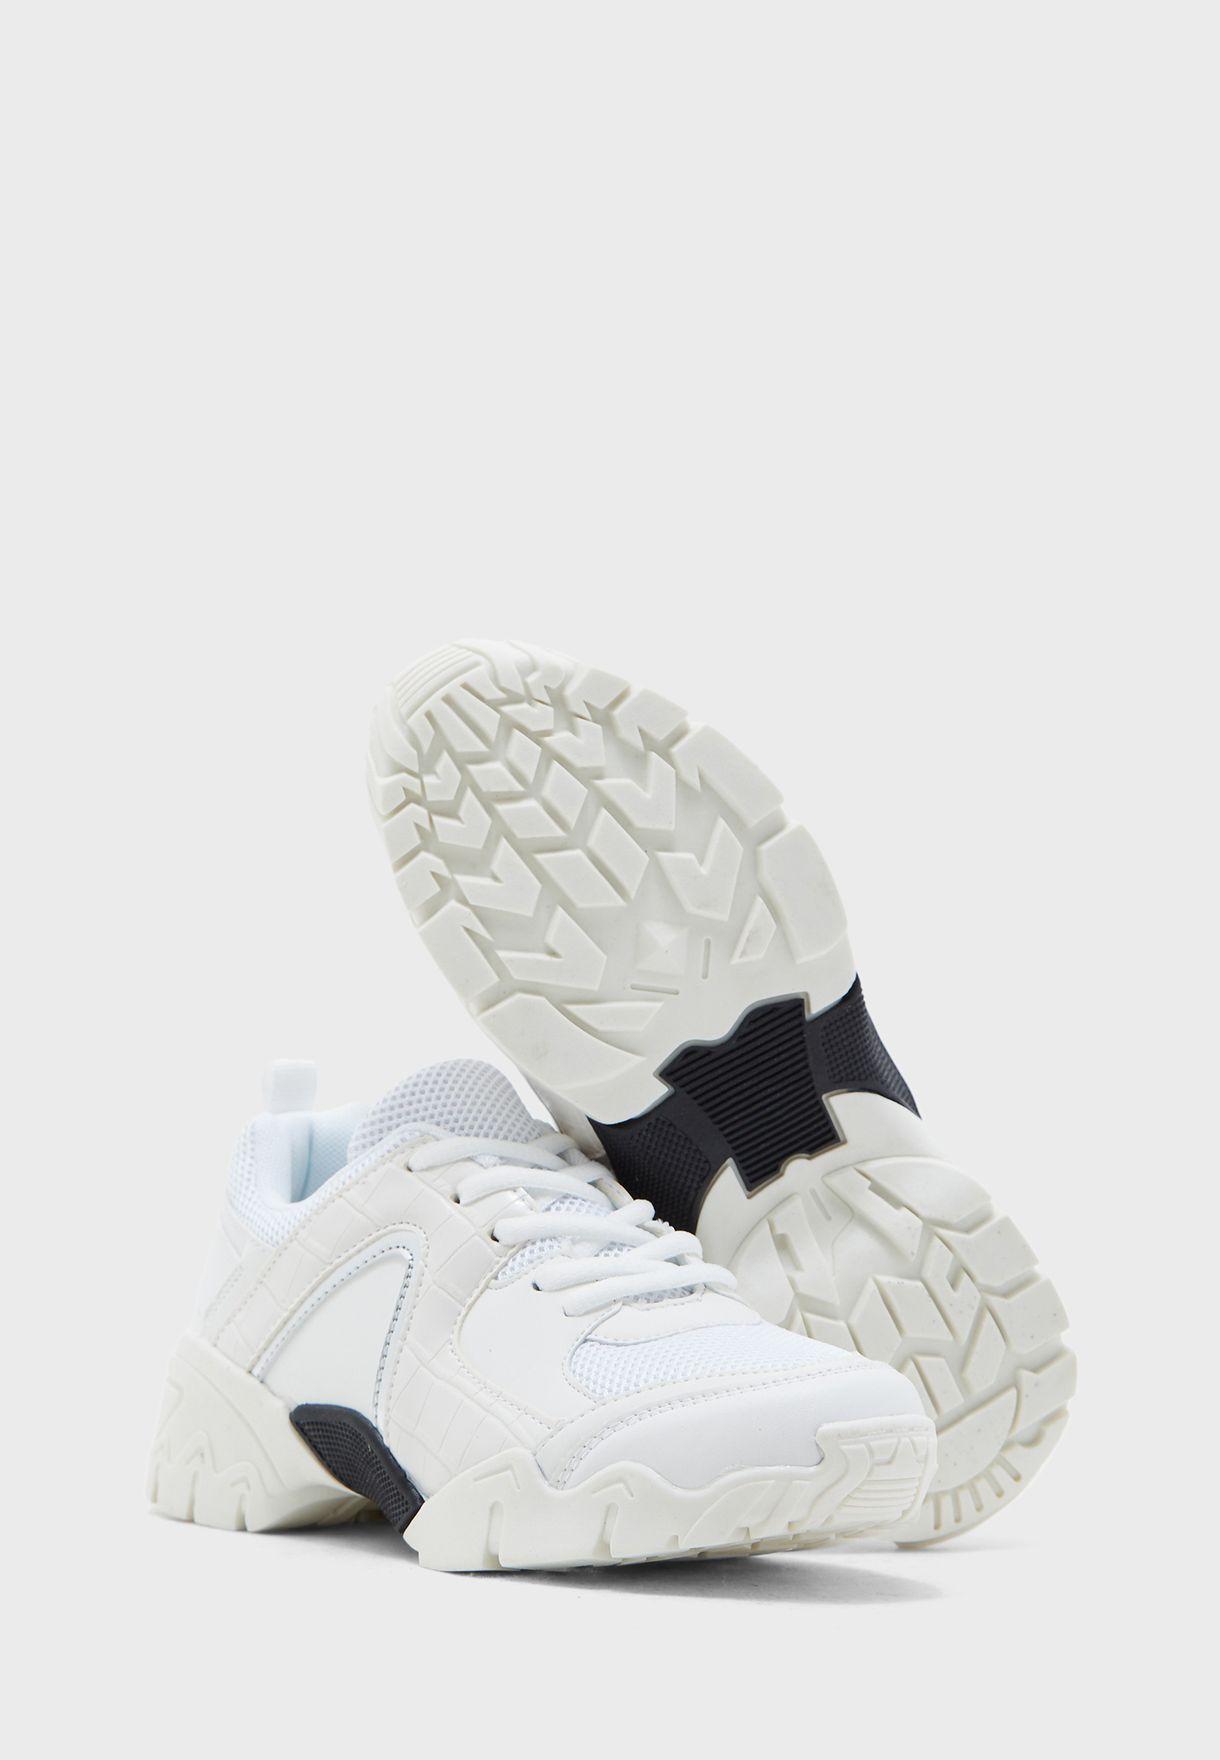 Croc Chunky Sneakers